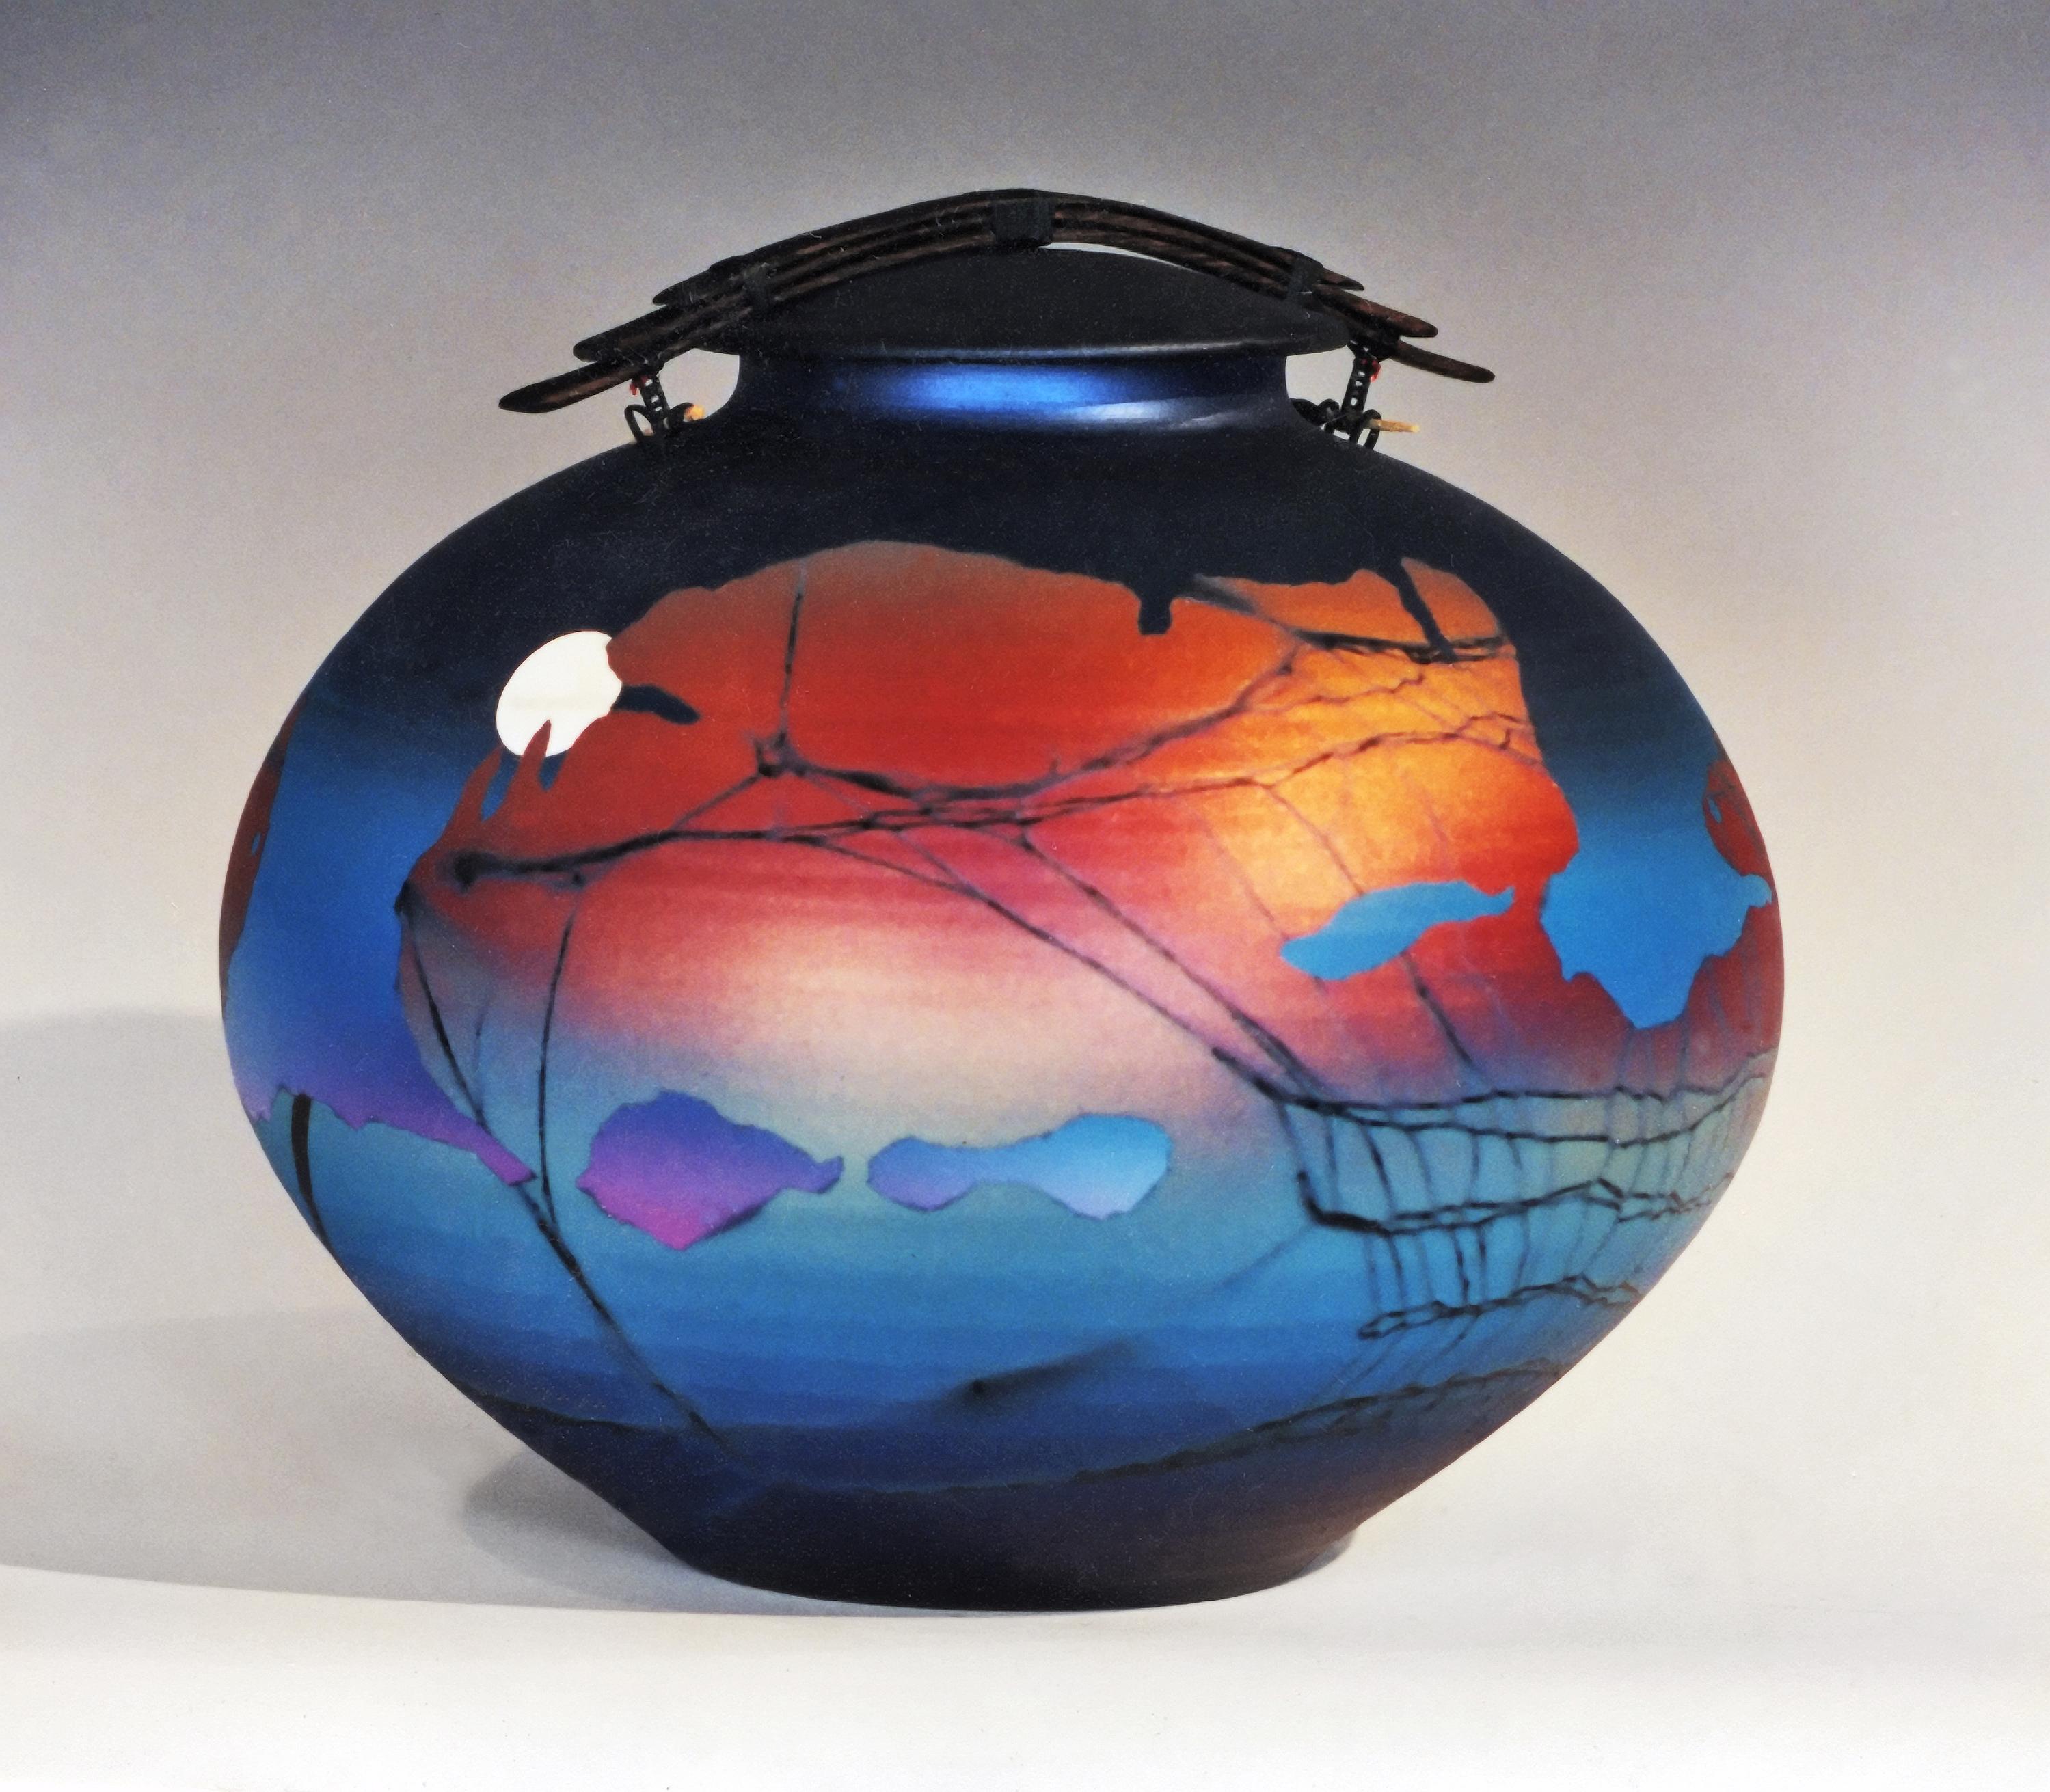 Glass Haus Green Bay : Artists new art studio tour